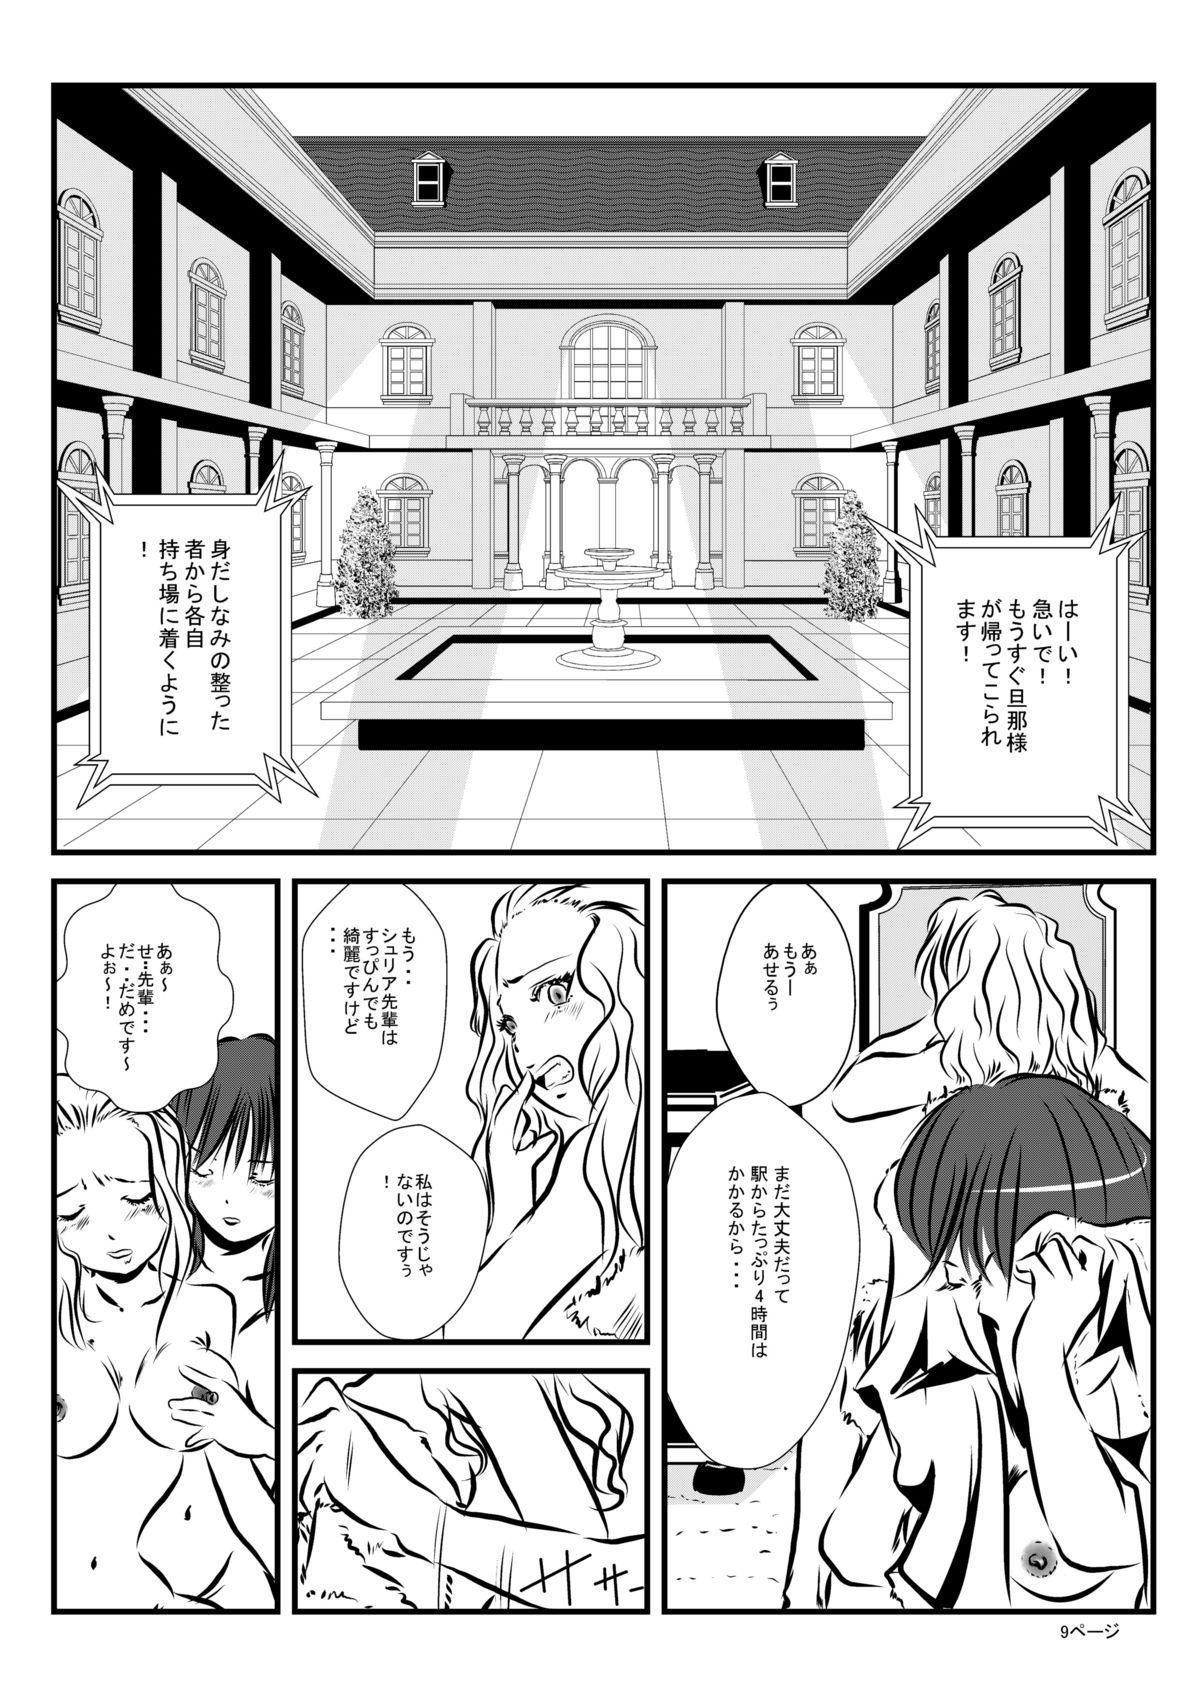 Loli Type no Jikkensitsu 7